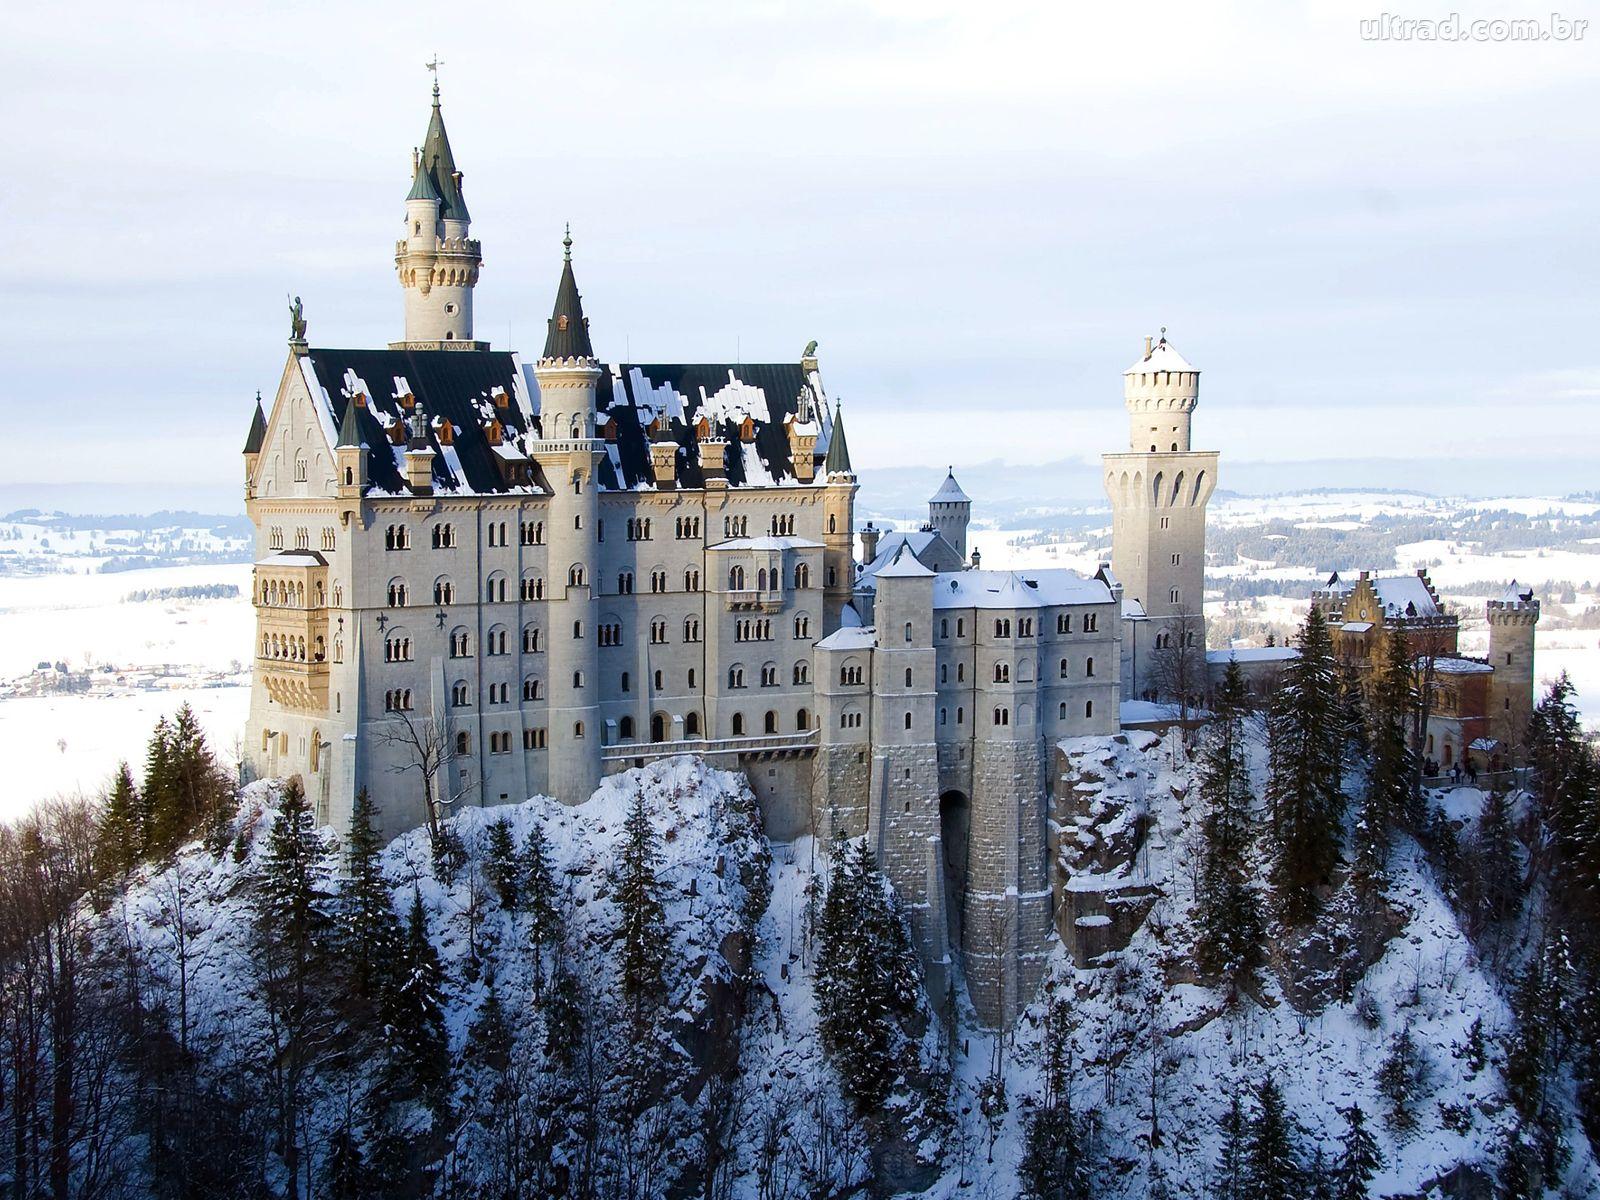 274576_Papel-de-Parede-Castelo-de-Neuschwanstein-Coberto-de-Neve_1600x1200